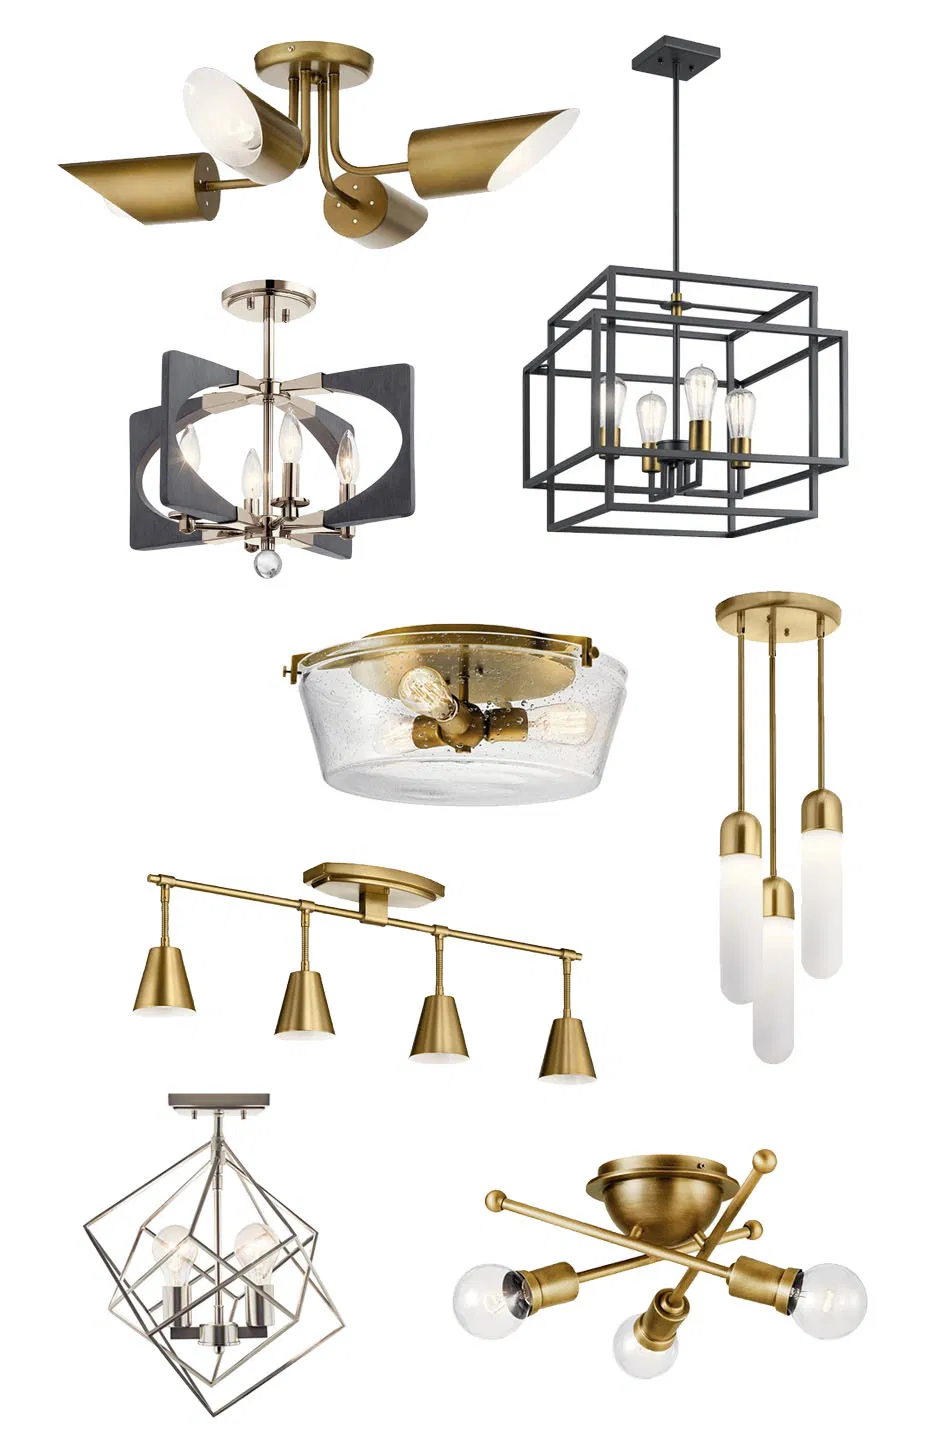 Mid Century Modern Lighting Options For Millie S Remodel In 2020 Modern Lighting Mid Century Modern Lighting Diy Remodel